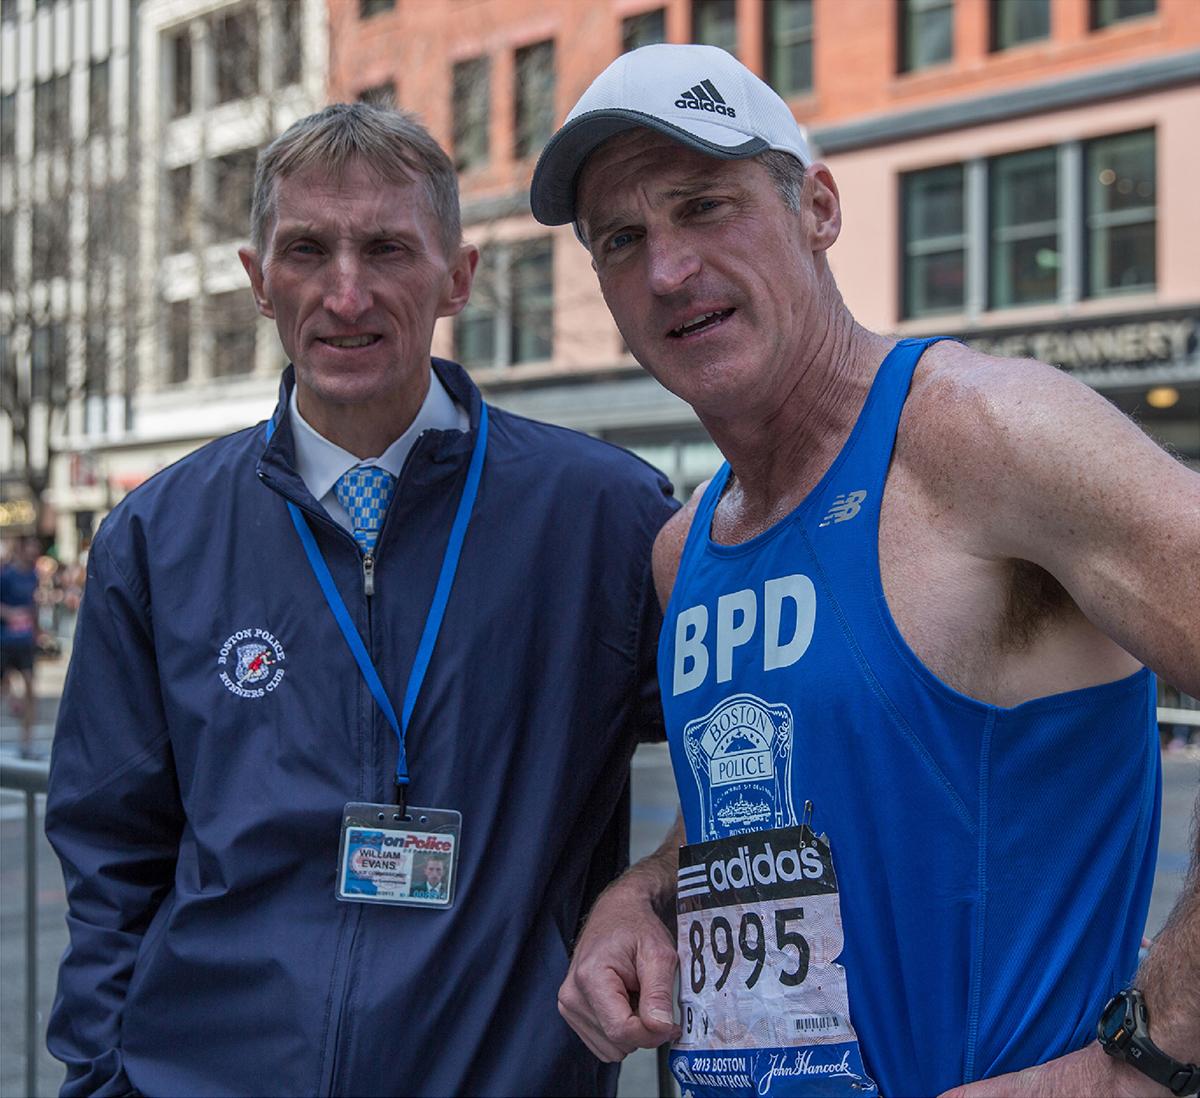 patriots day movie william evans boston police superintendent james colby